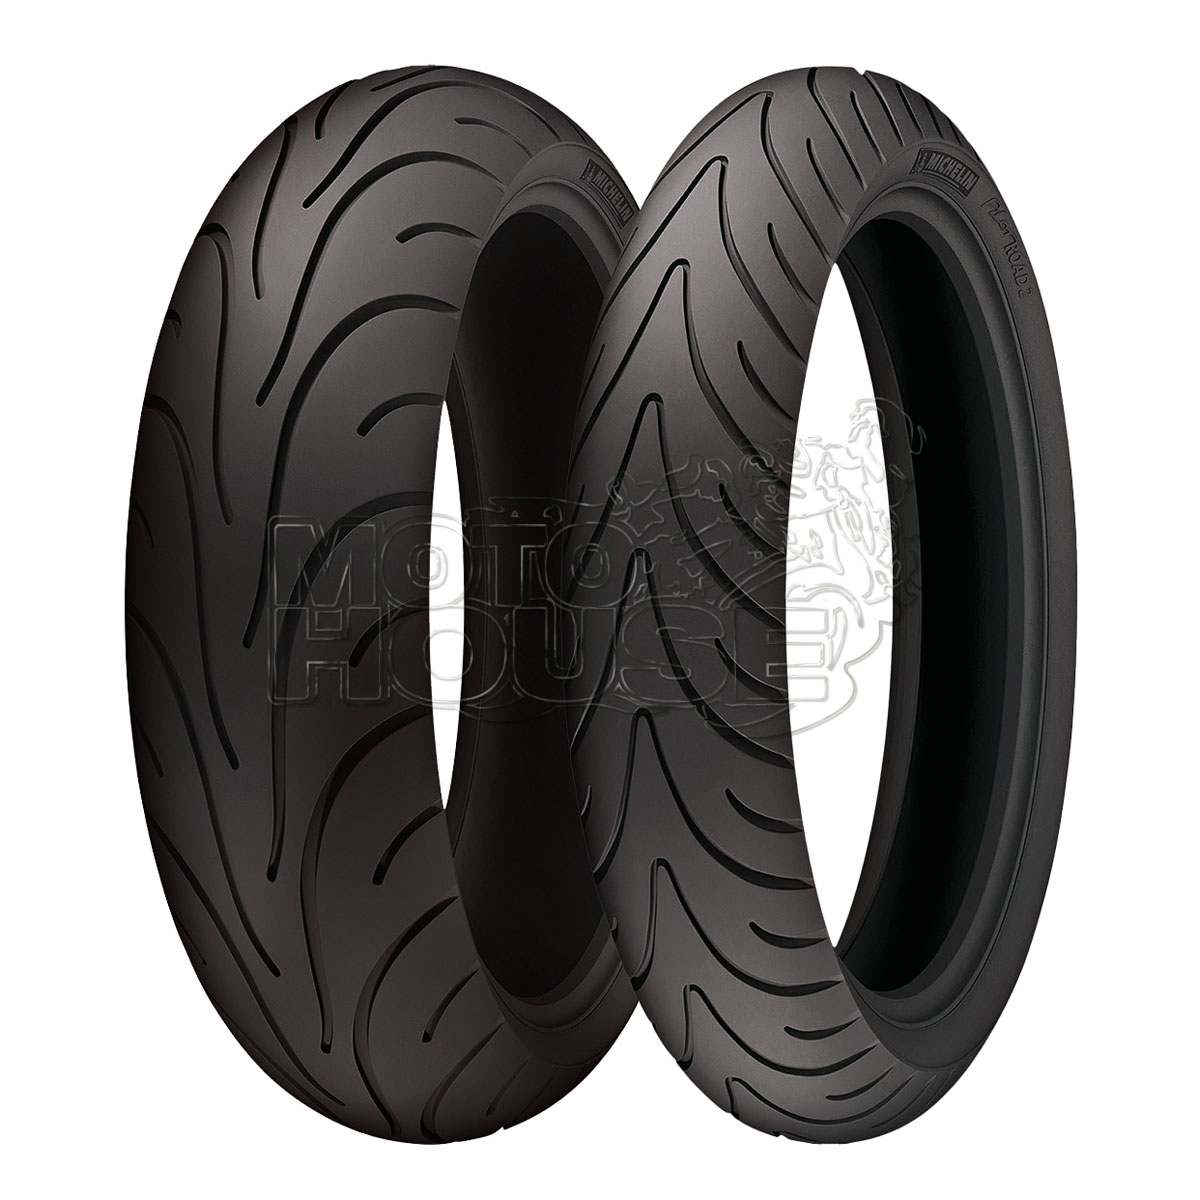 Llanta Para Motocicleta Michelin Pilot Road 2 120/70-17 58w